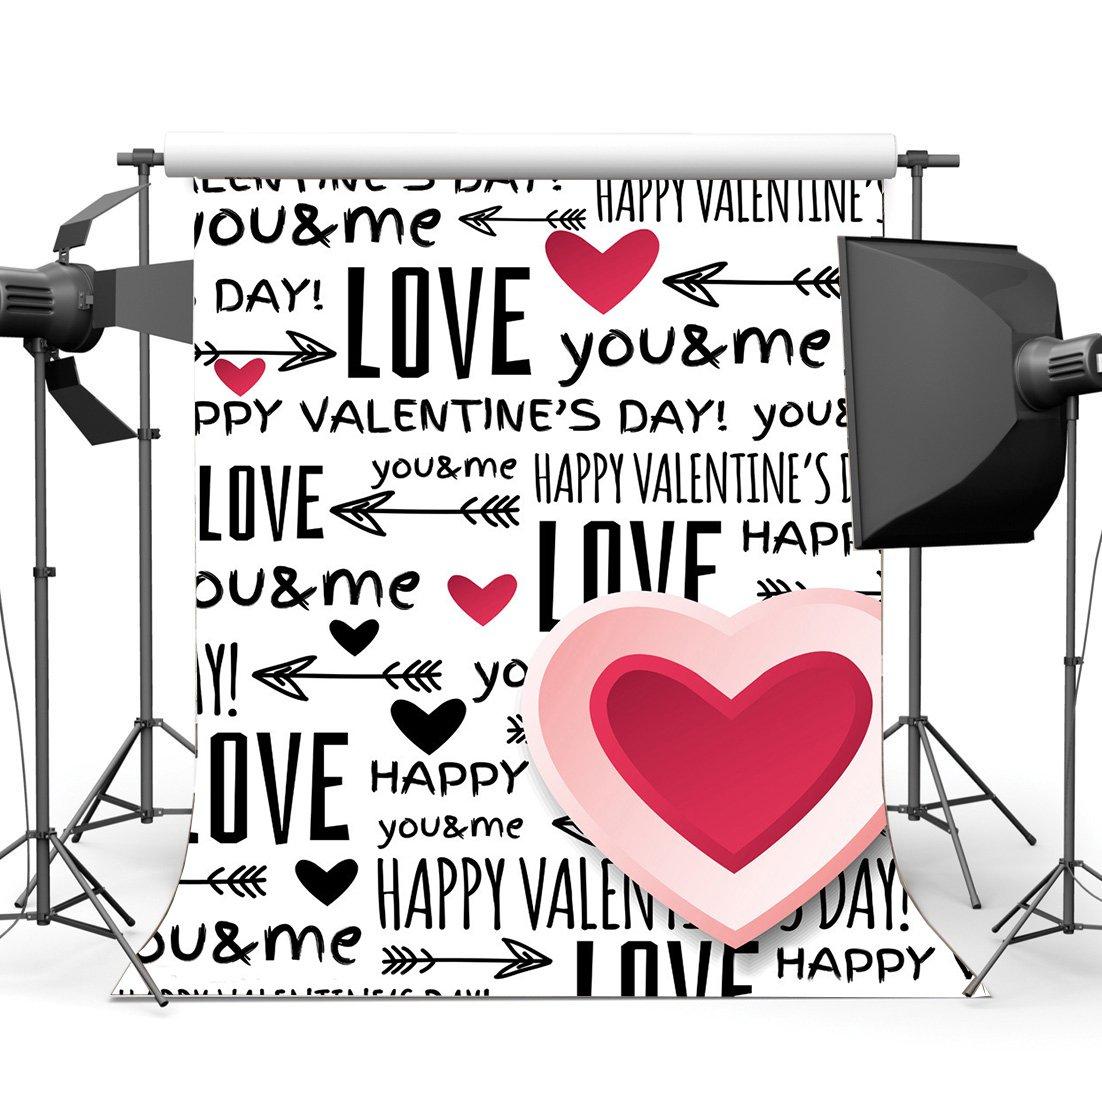 gladbuyビニール3 x 5ft Happy Valentine 's Day Backdrop Sweet Hearts Love You and Me Cupid 's Arrowロマンチック壁紙写真背景のガールズベビーウェディングパーティー飾り写真スタジオ小道具kx142   B079NPLTN1